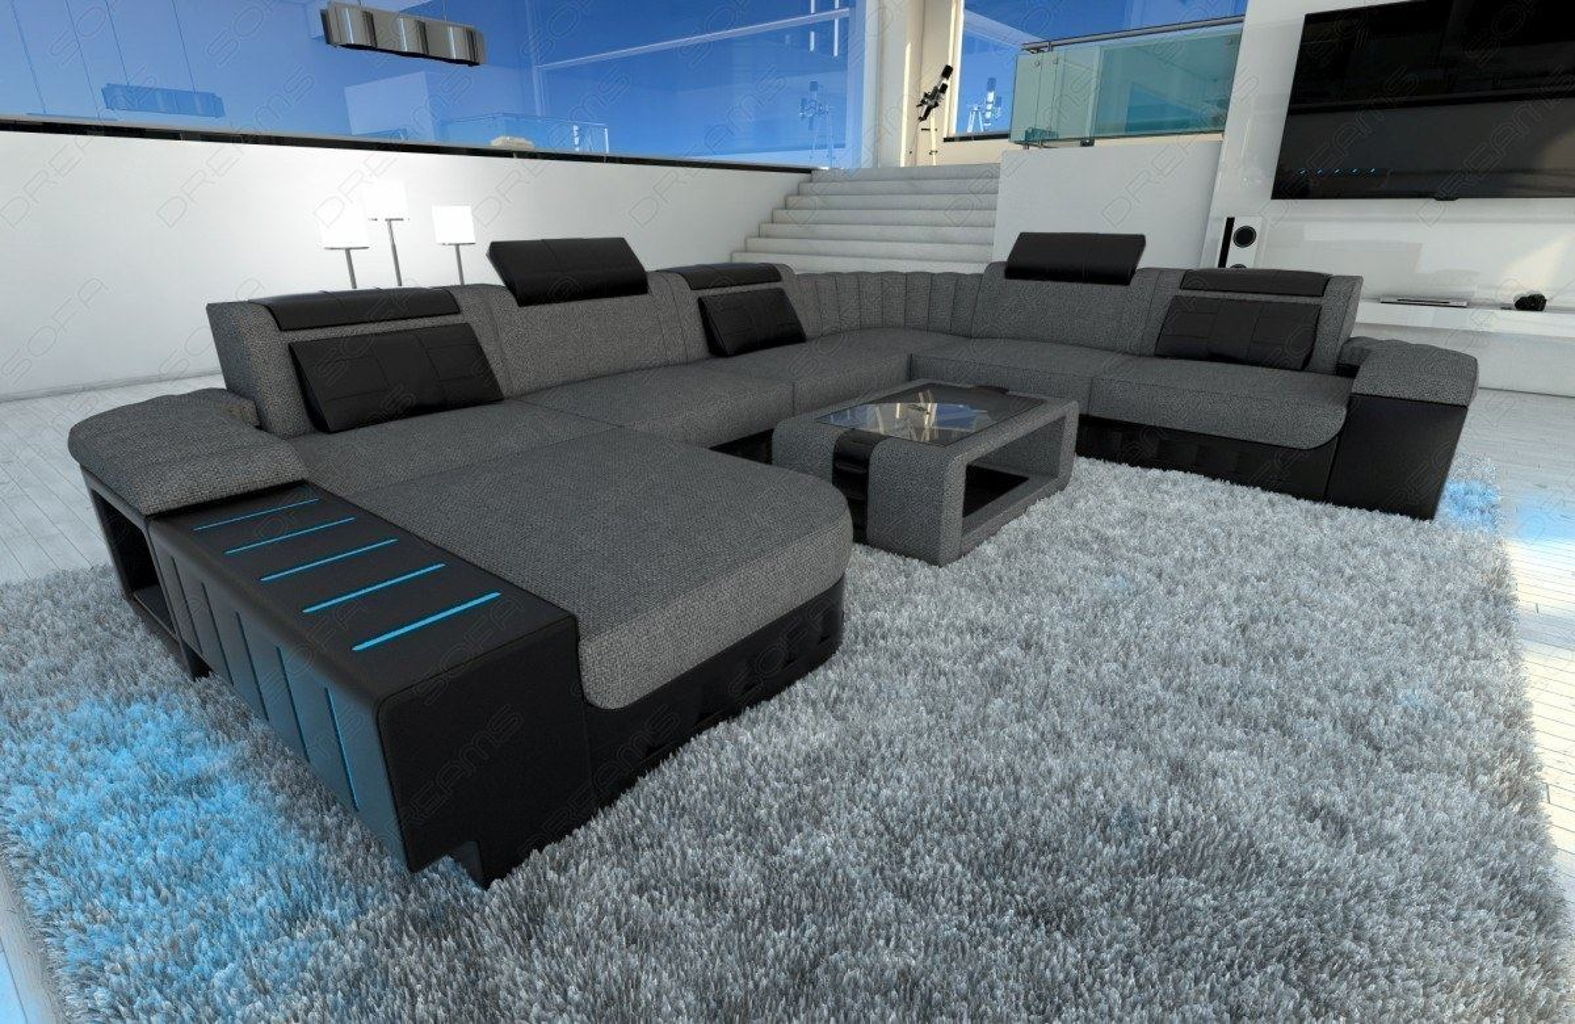 wohnlandschaft polstersofa strukturstoff grau bellagio xxl led beleuchtung rgb ebay. Black Bedroom Furniture Sets. Home Design Ideas